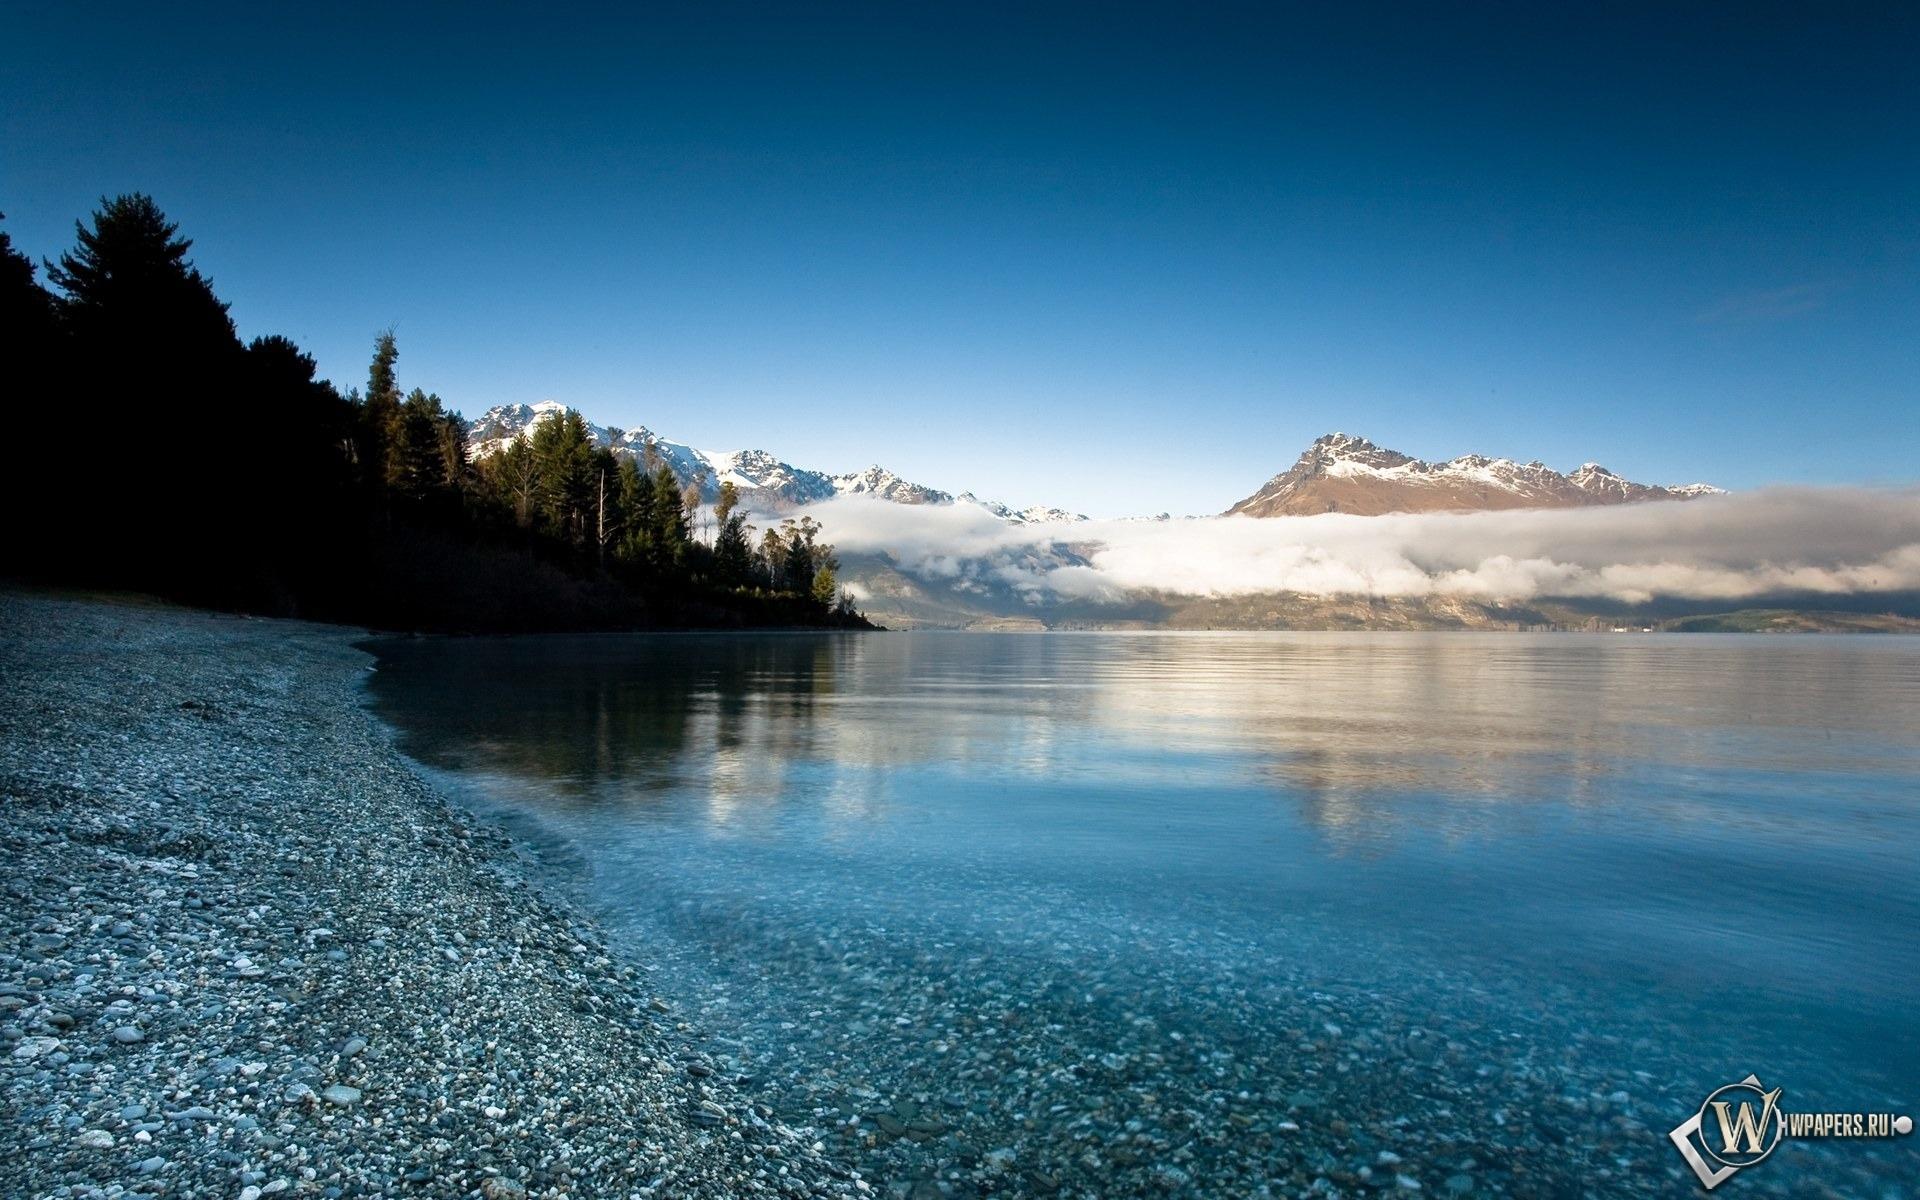 Красивое озеро 1920x1200